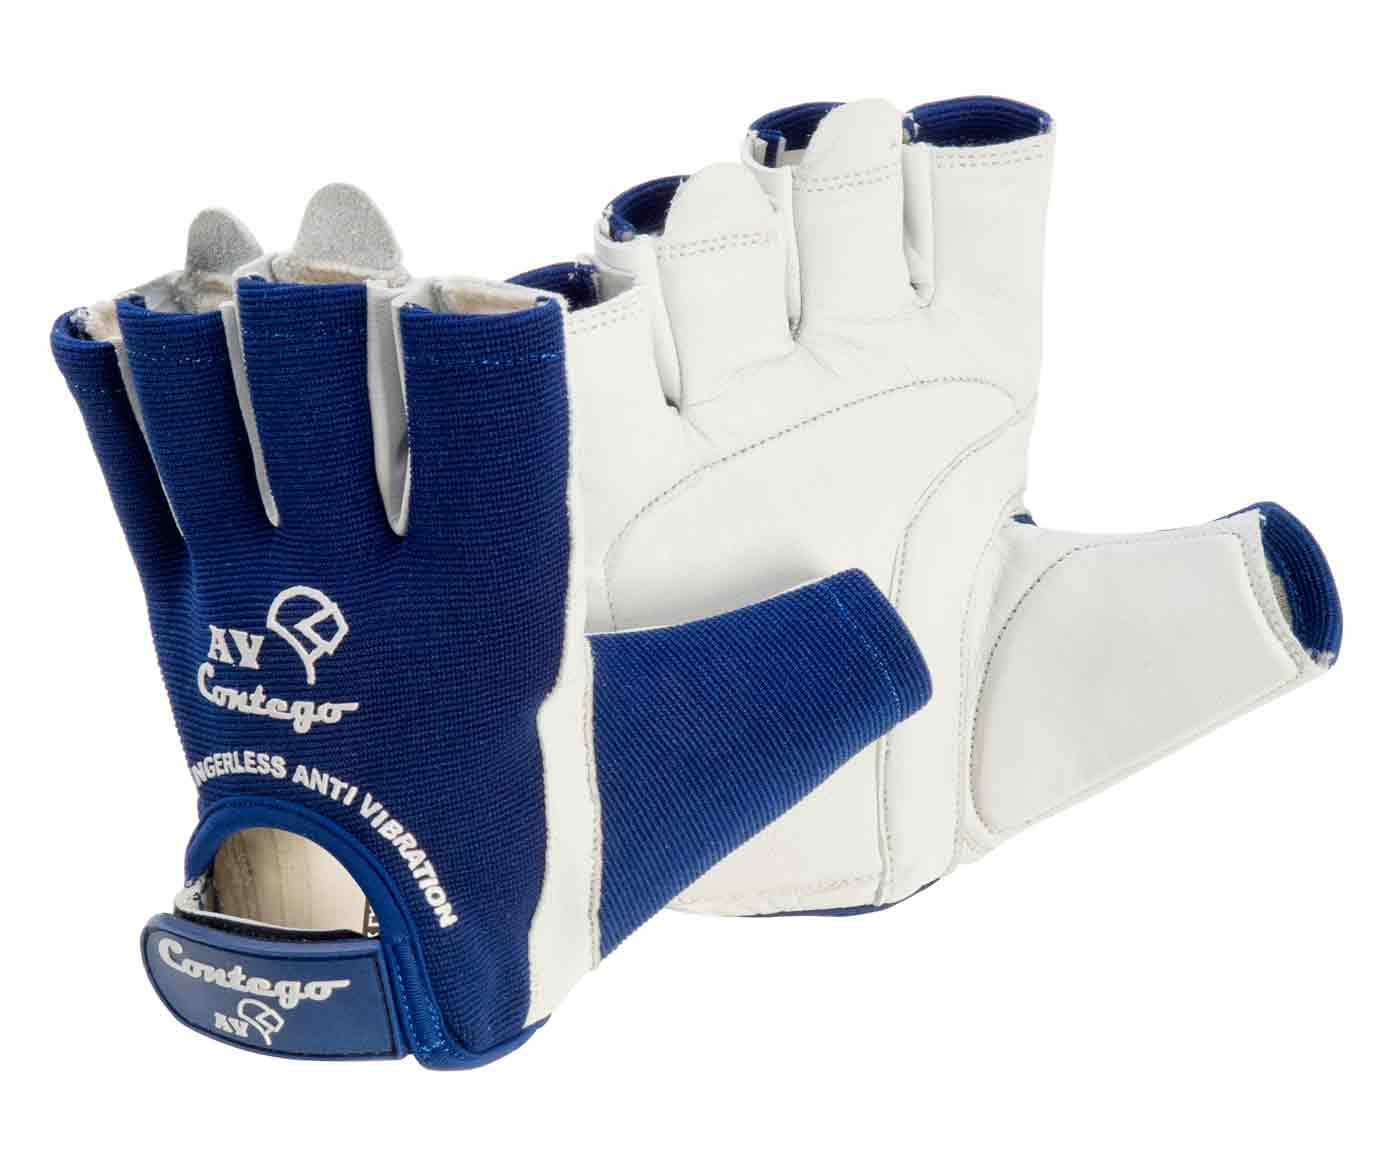 fingerless anti vibration contego work safety gloves